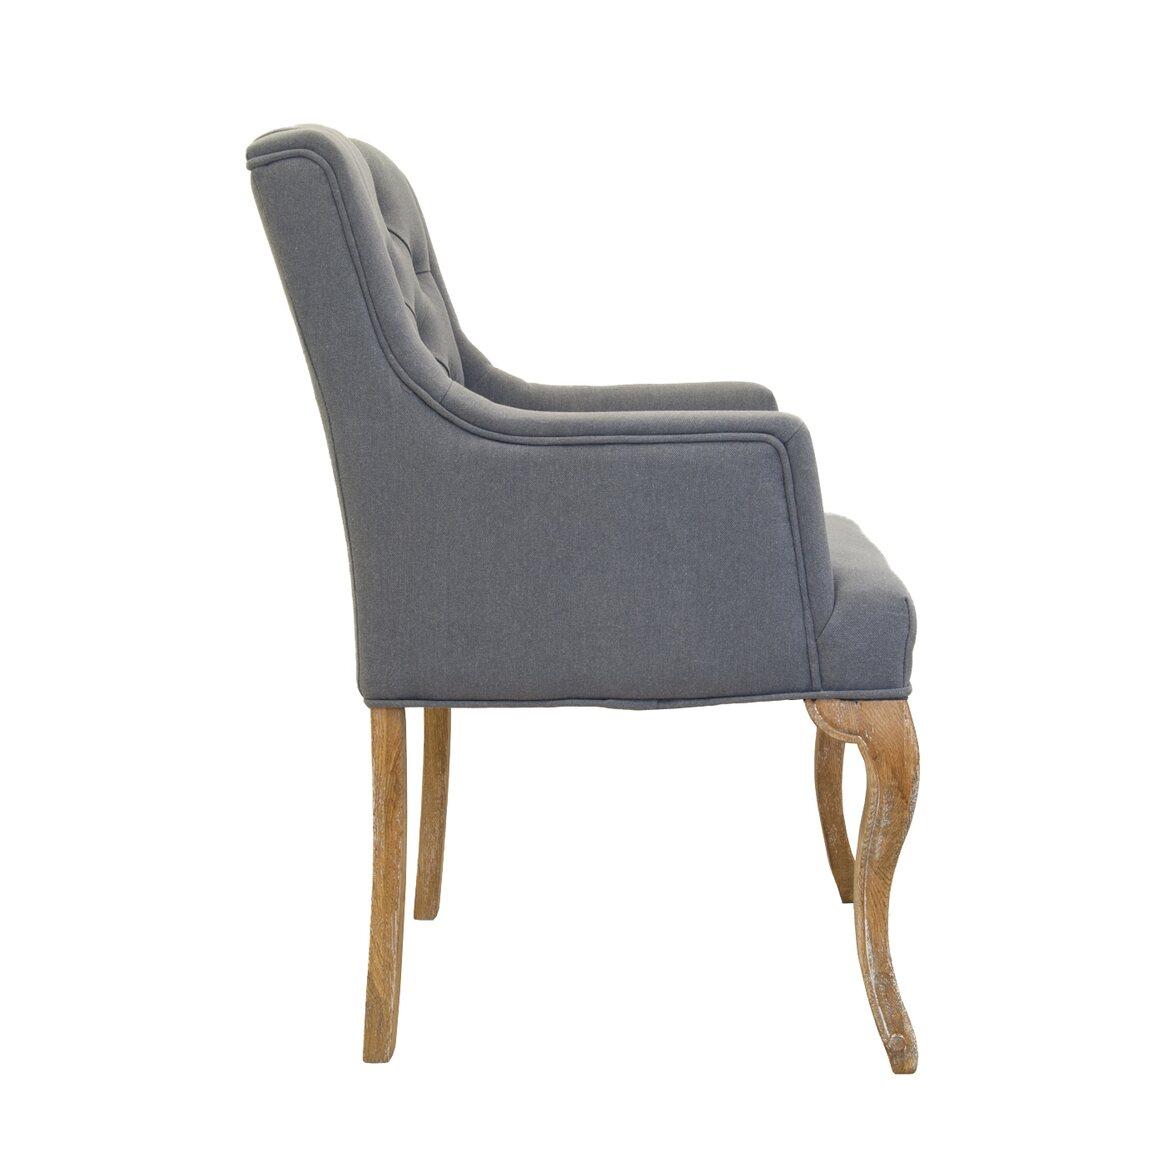 Кресло Deron grey 2 | Кресло-стул Kingsby